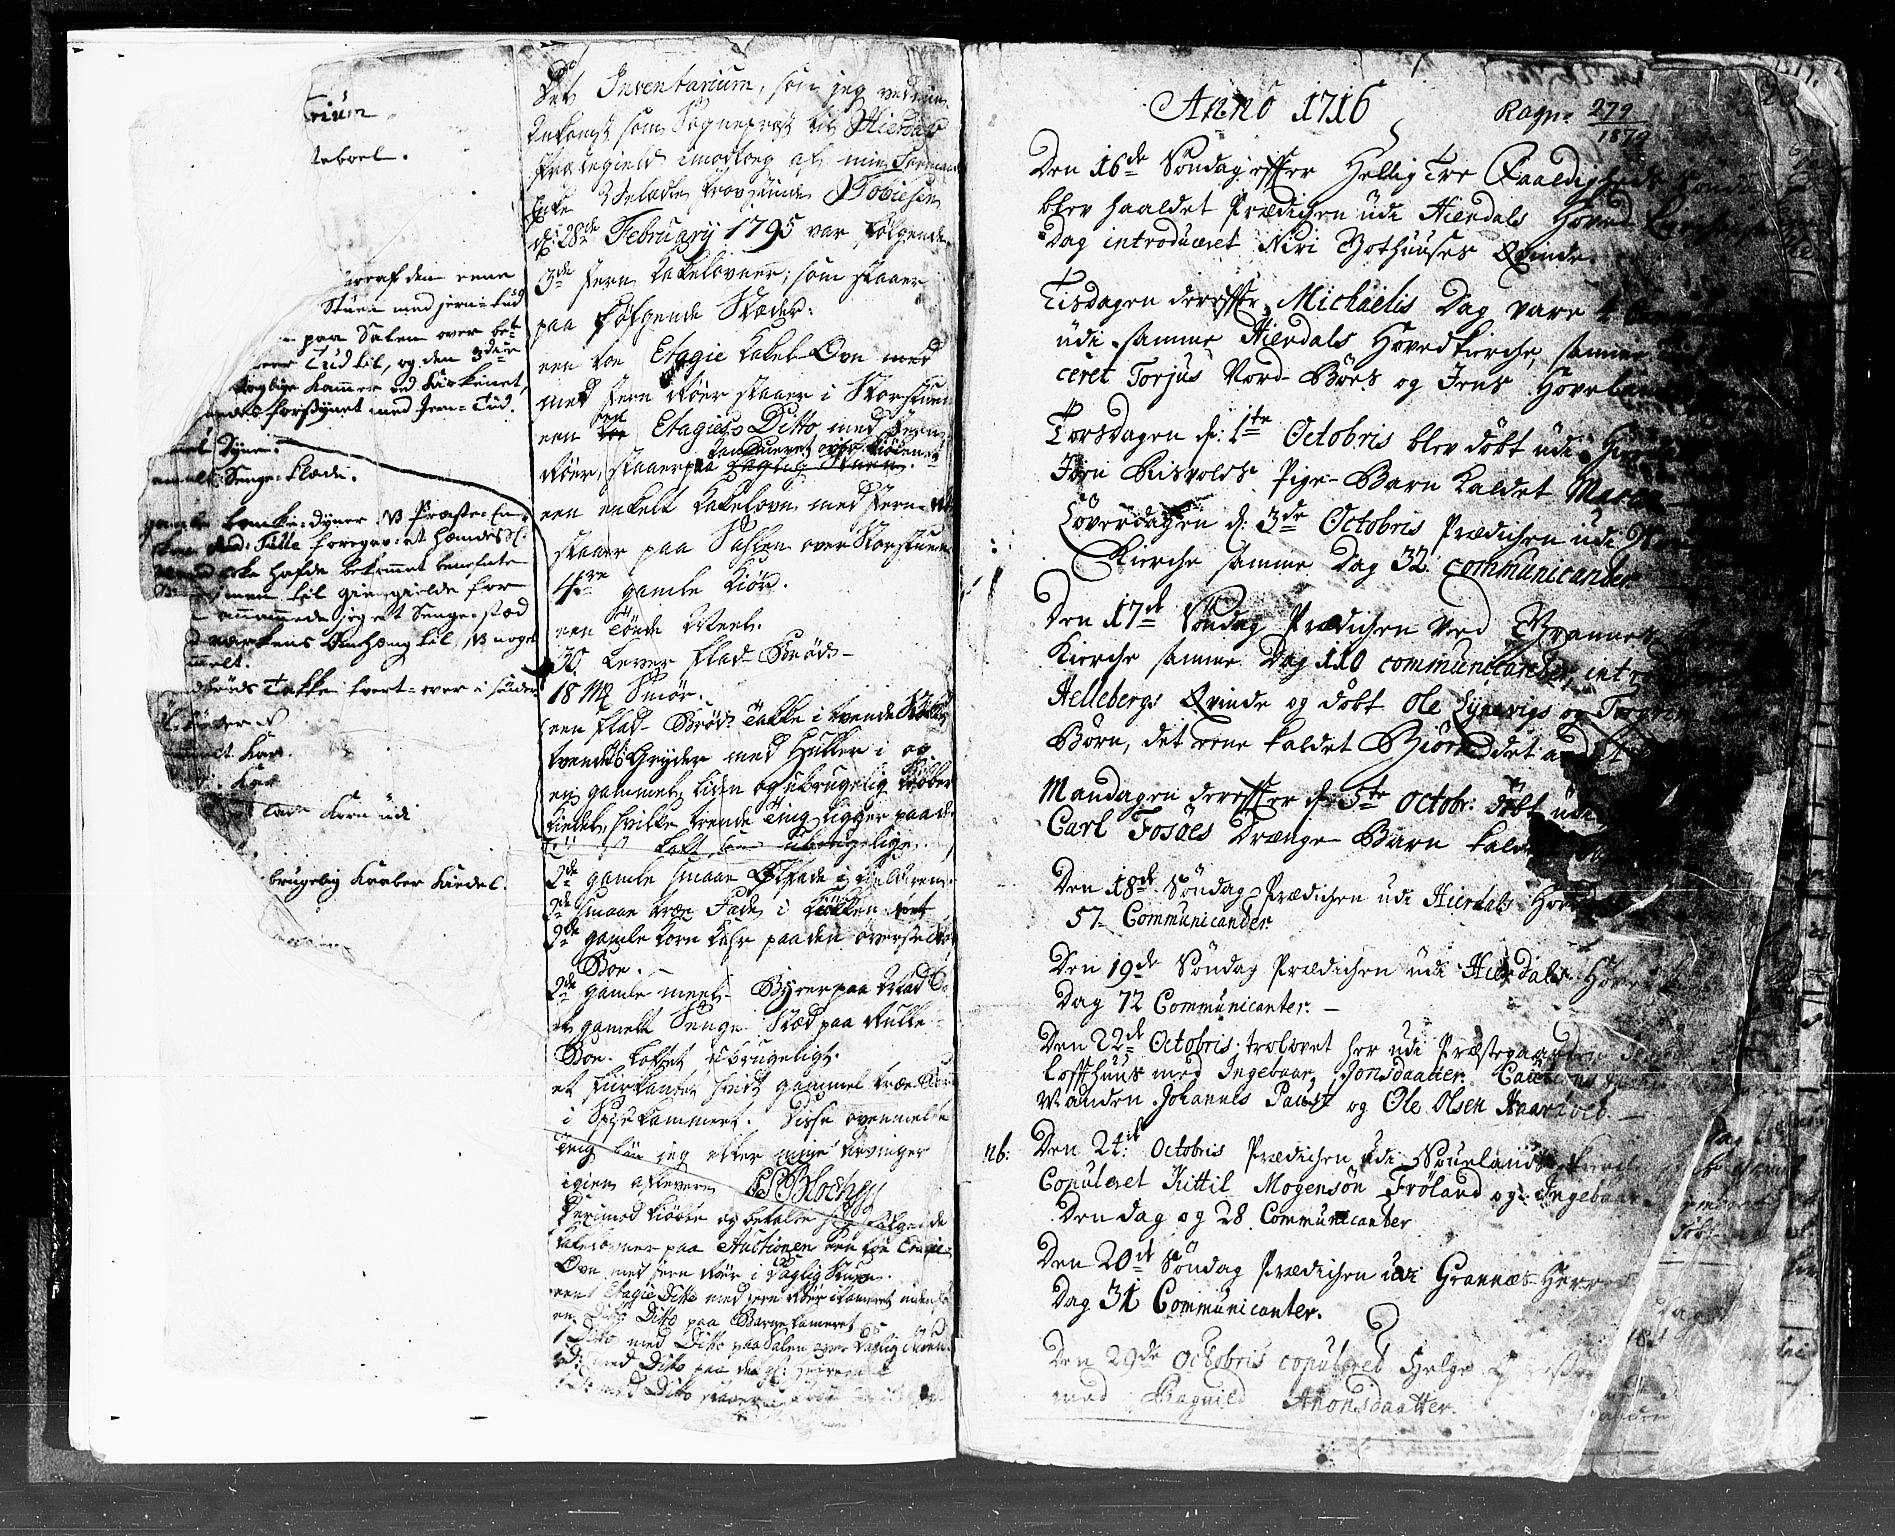 SAKO, Hjartdal kirkebøker, F/Fa/L0002: Ministerialbok nr. I 2, 1716-1754, s. 0-1